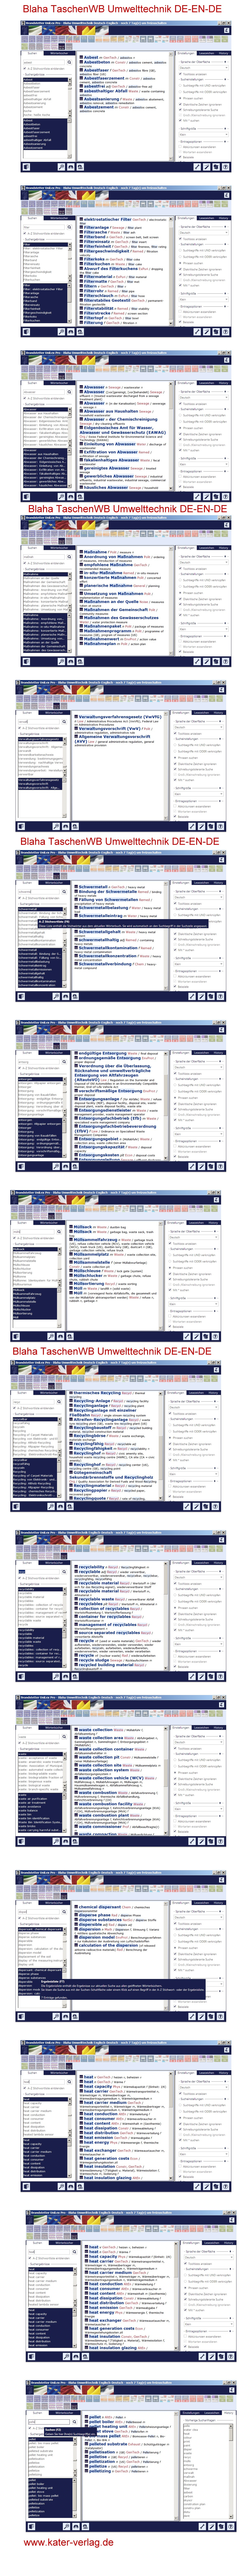 Blaha: Taschenwörterbuch der Umwelttechnik Englisch DE-EN, EN-DE ONLINE